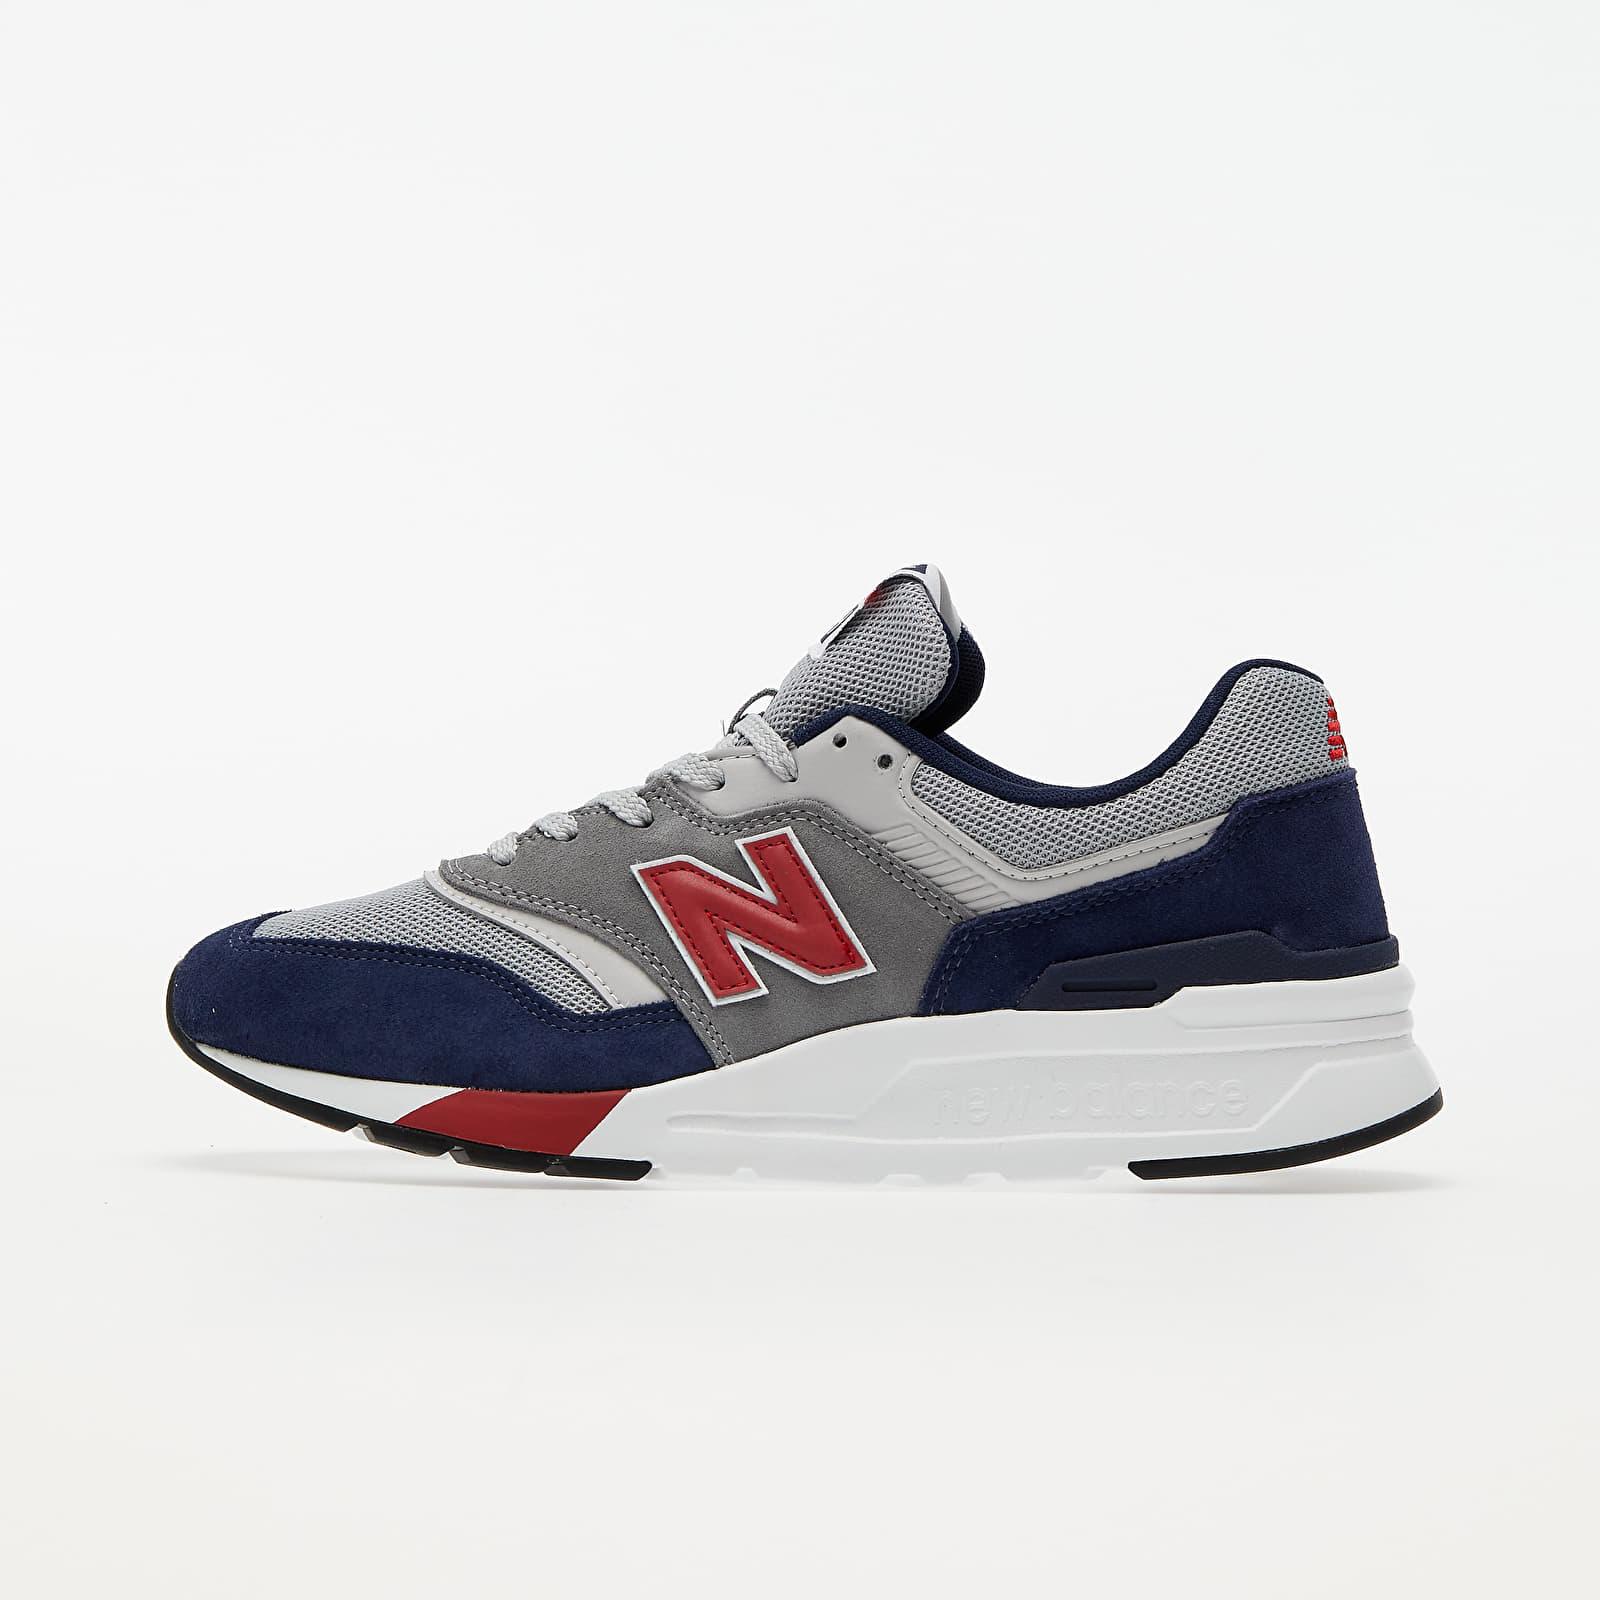 New Balance 997 Blue/ Grey/ Red EUR 41.5